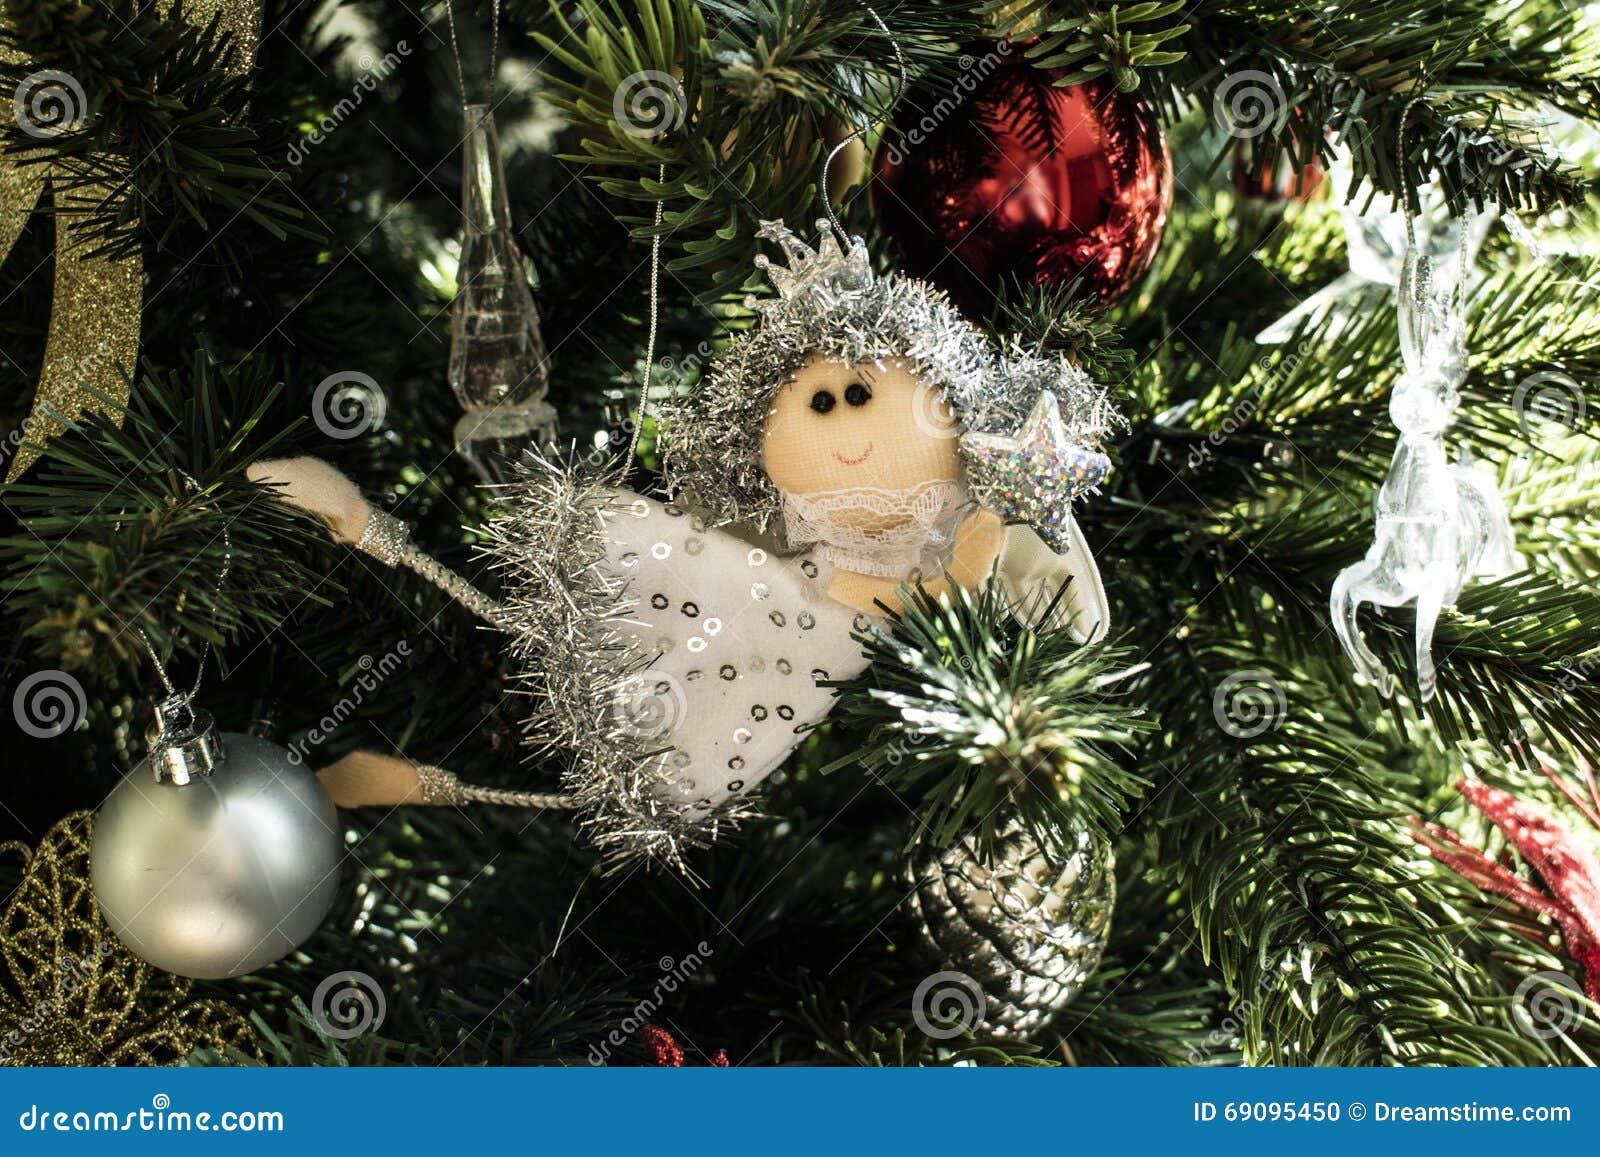 Marvelous Fairy On Christmas Tree Part - 12: A Fairy On The Christmas Tree